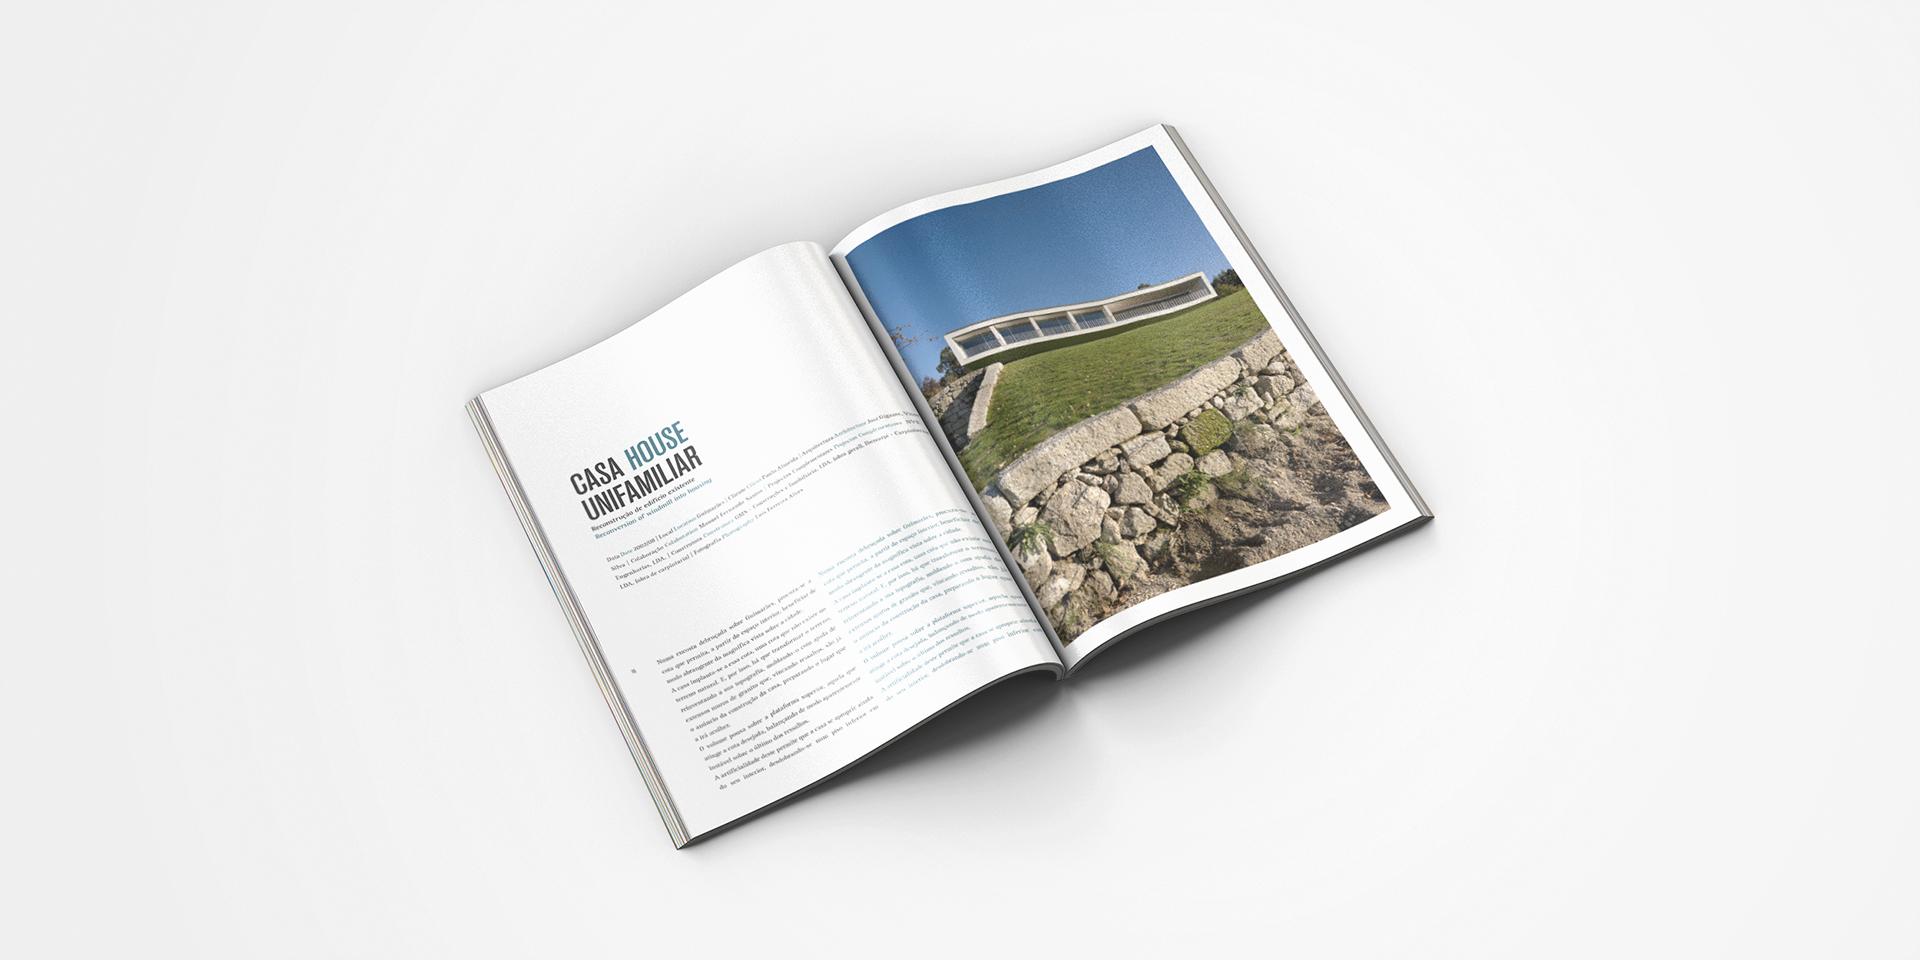 Design-Grafico-Graphic-Design-Publicacao-Editorial-Paginacao-Portfolio-Arquitectura-Architecture-Jose-Gigante-bonjourmolotov N.jpg